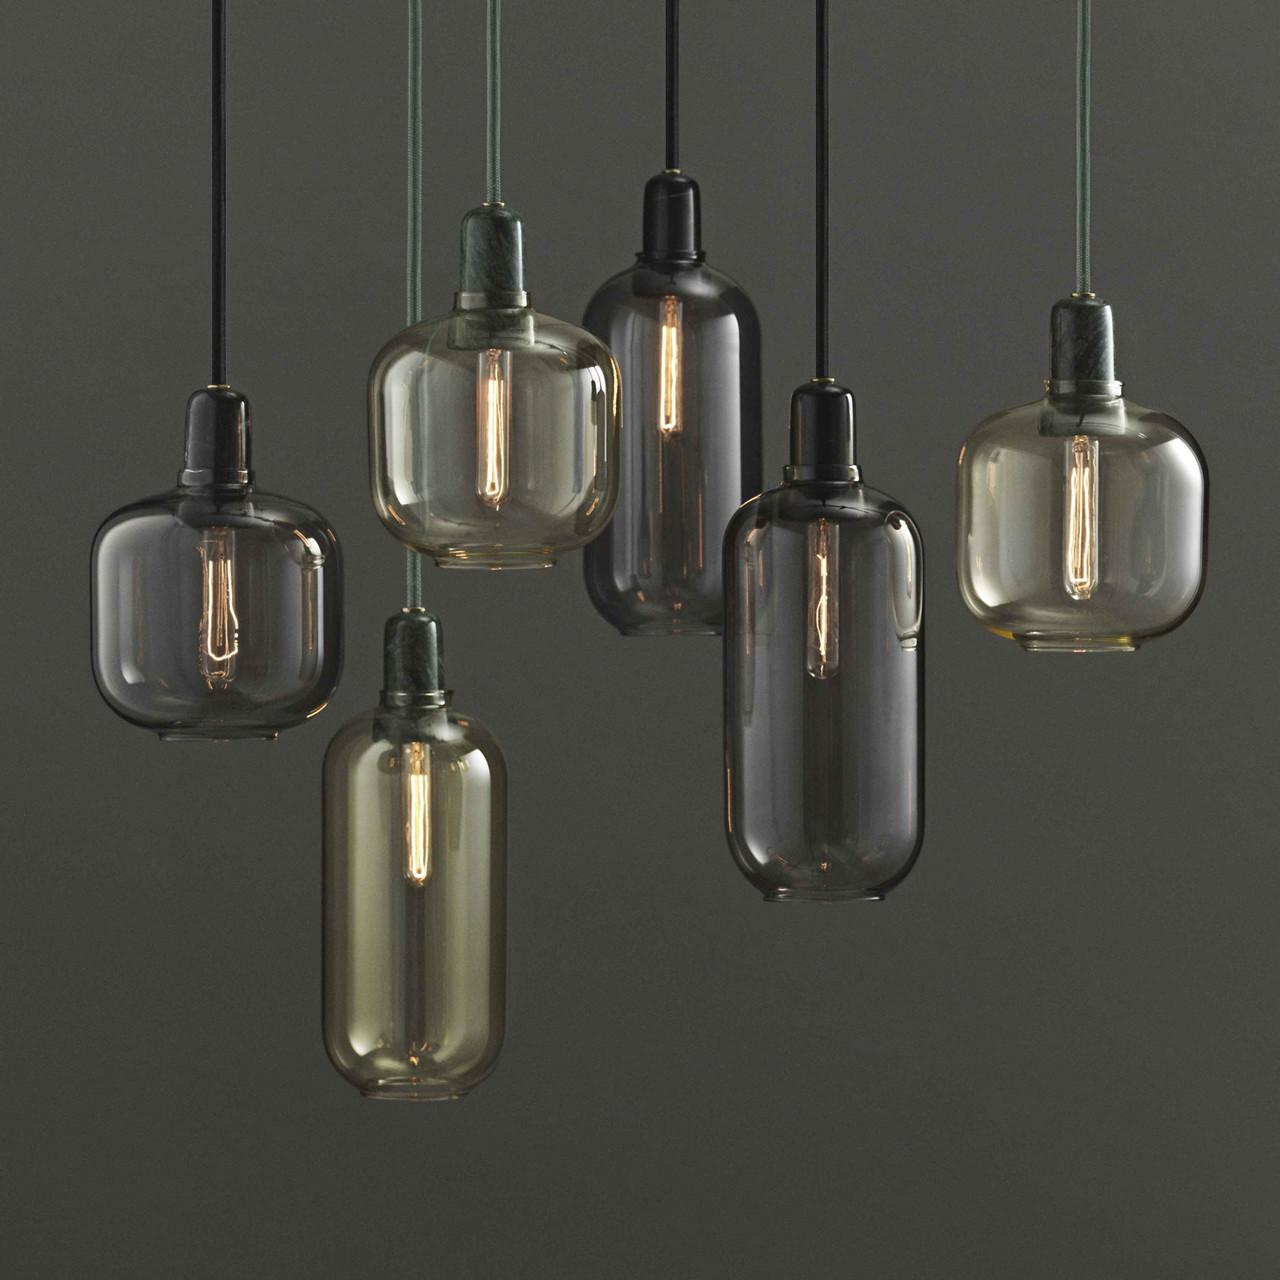 Normann Cph Amp Lampe – pris 799.00